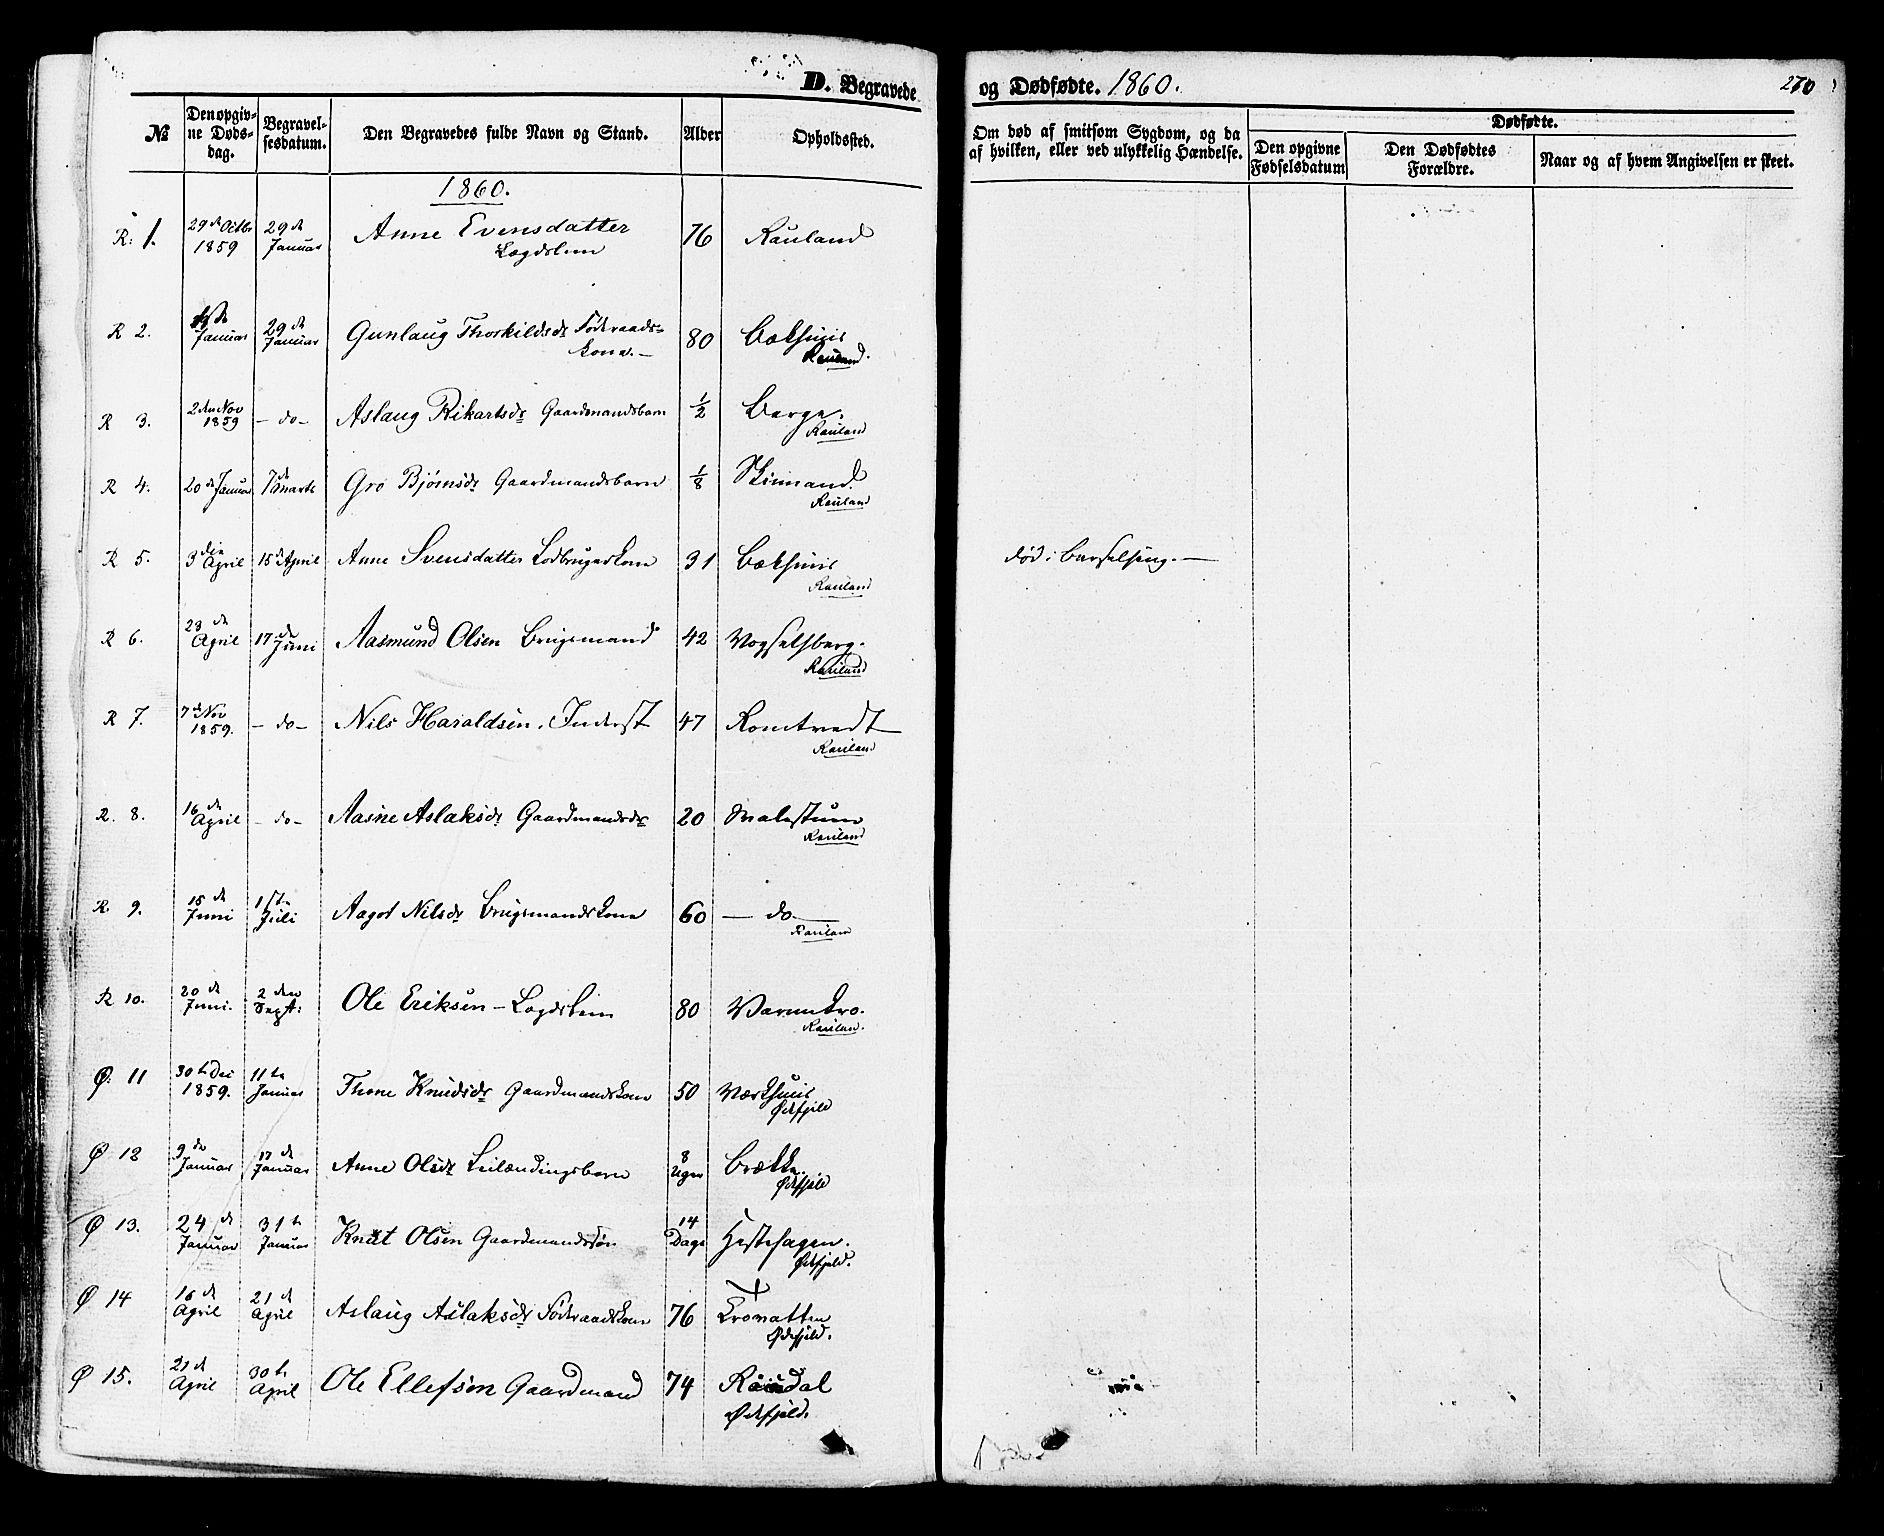 SAKO, Rauland kirkebøker, F/Fa/L0003: Ministerialbok nr. 3, 1859-1886, s. 270